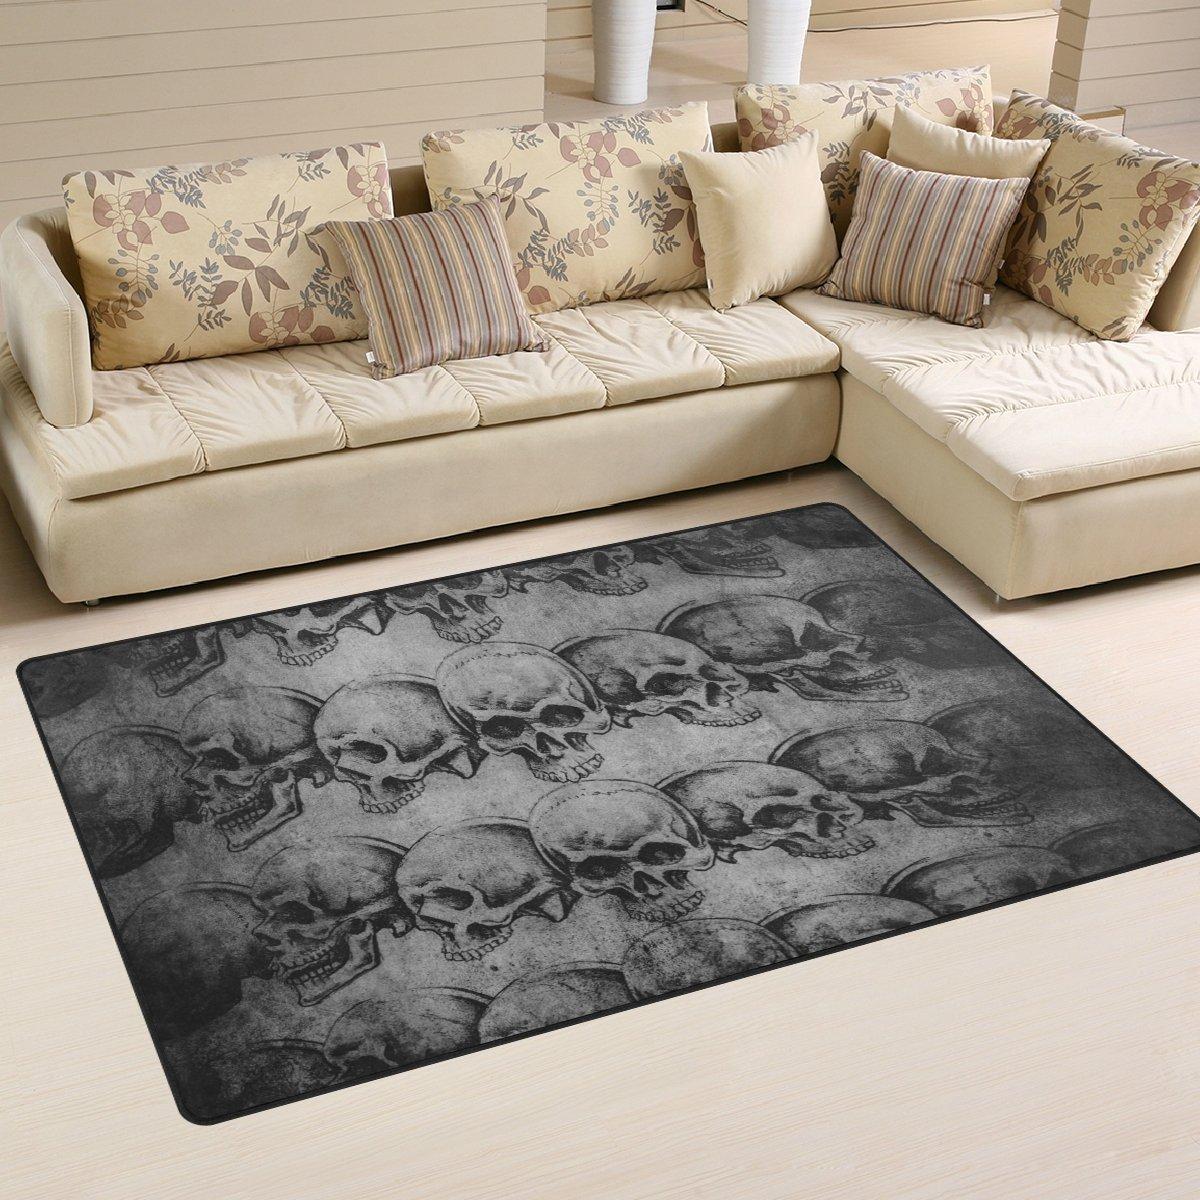 Naanle Sugar Skull Area Rug 3 x5 , Vintage Polyester Area Rug Mat for Living Dining Dorm Room Bedroom Home Decorative